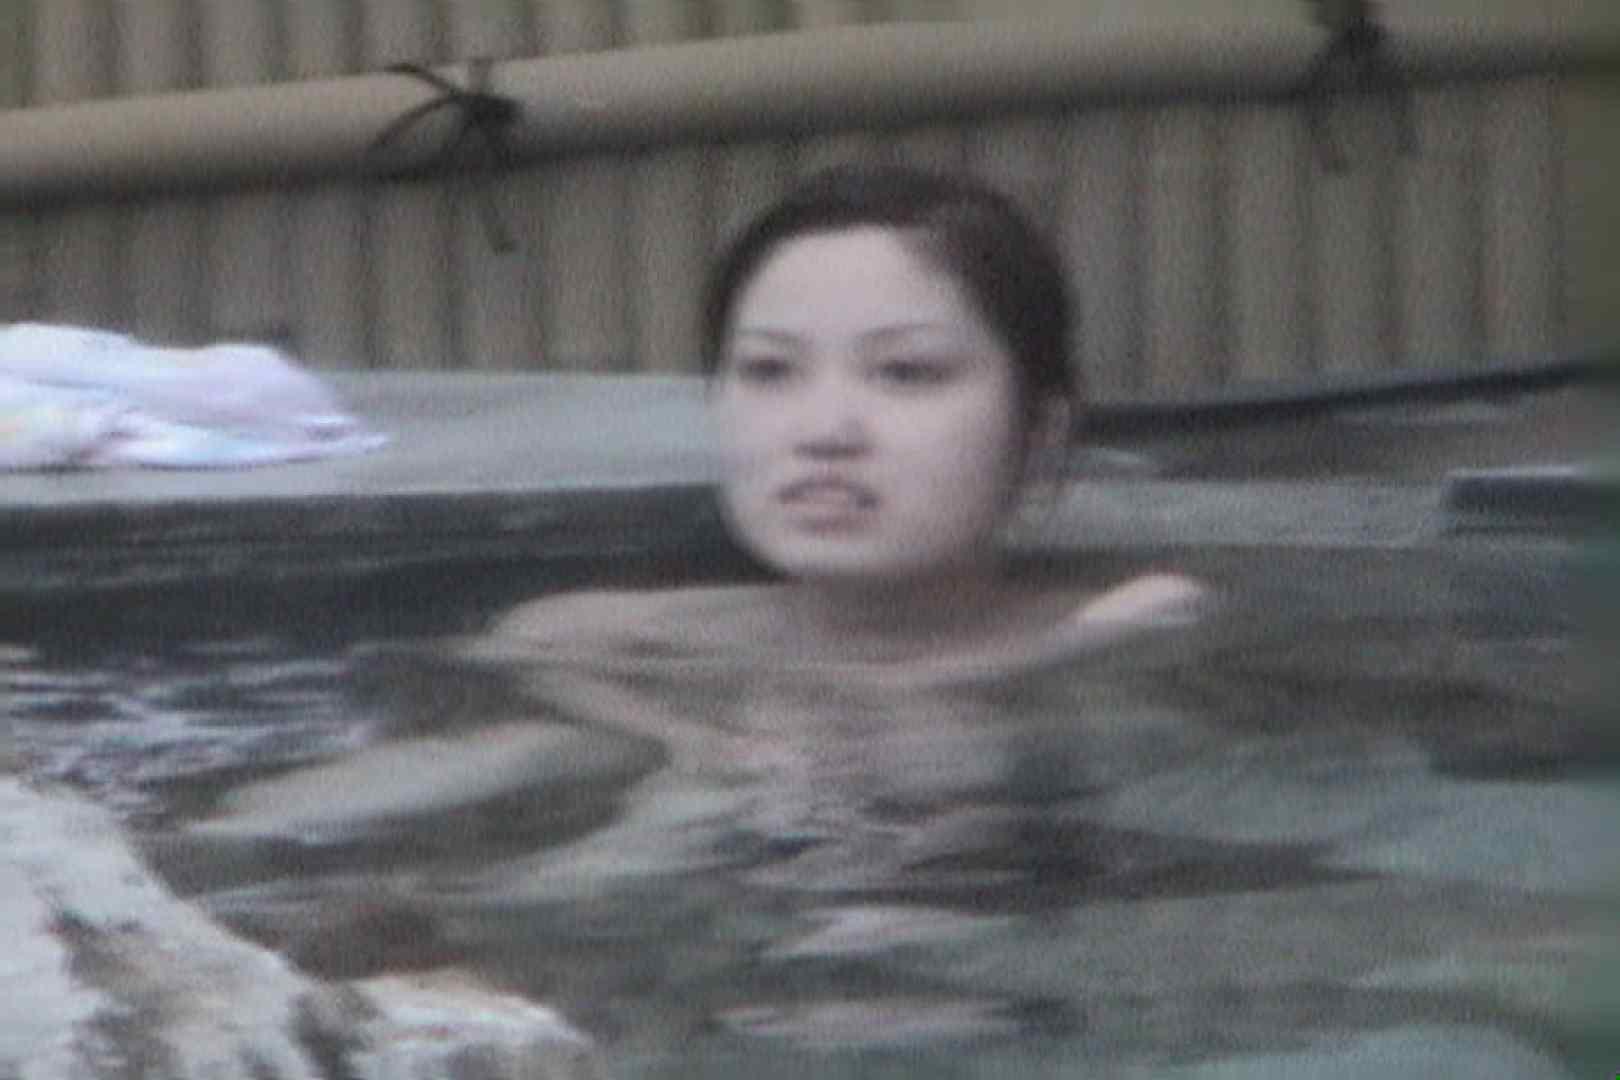 Aquaな露天風呂Vol.602 OLセックス 盗み撮りオマンコ動画キャプチャ 70画像 26